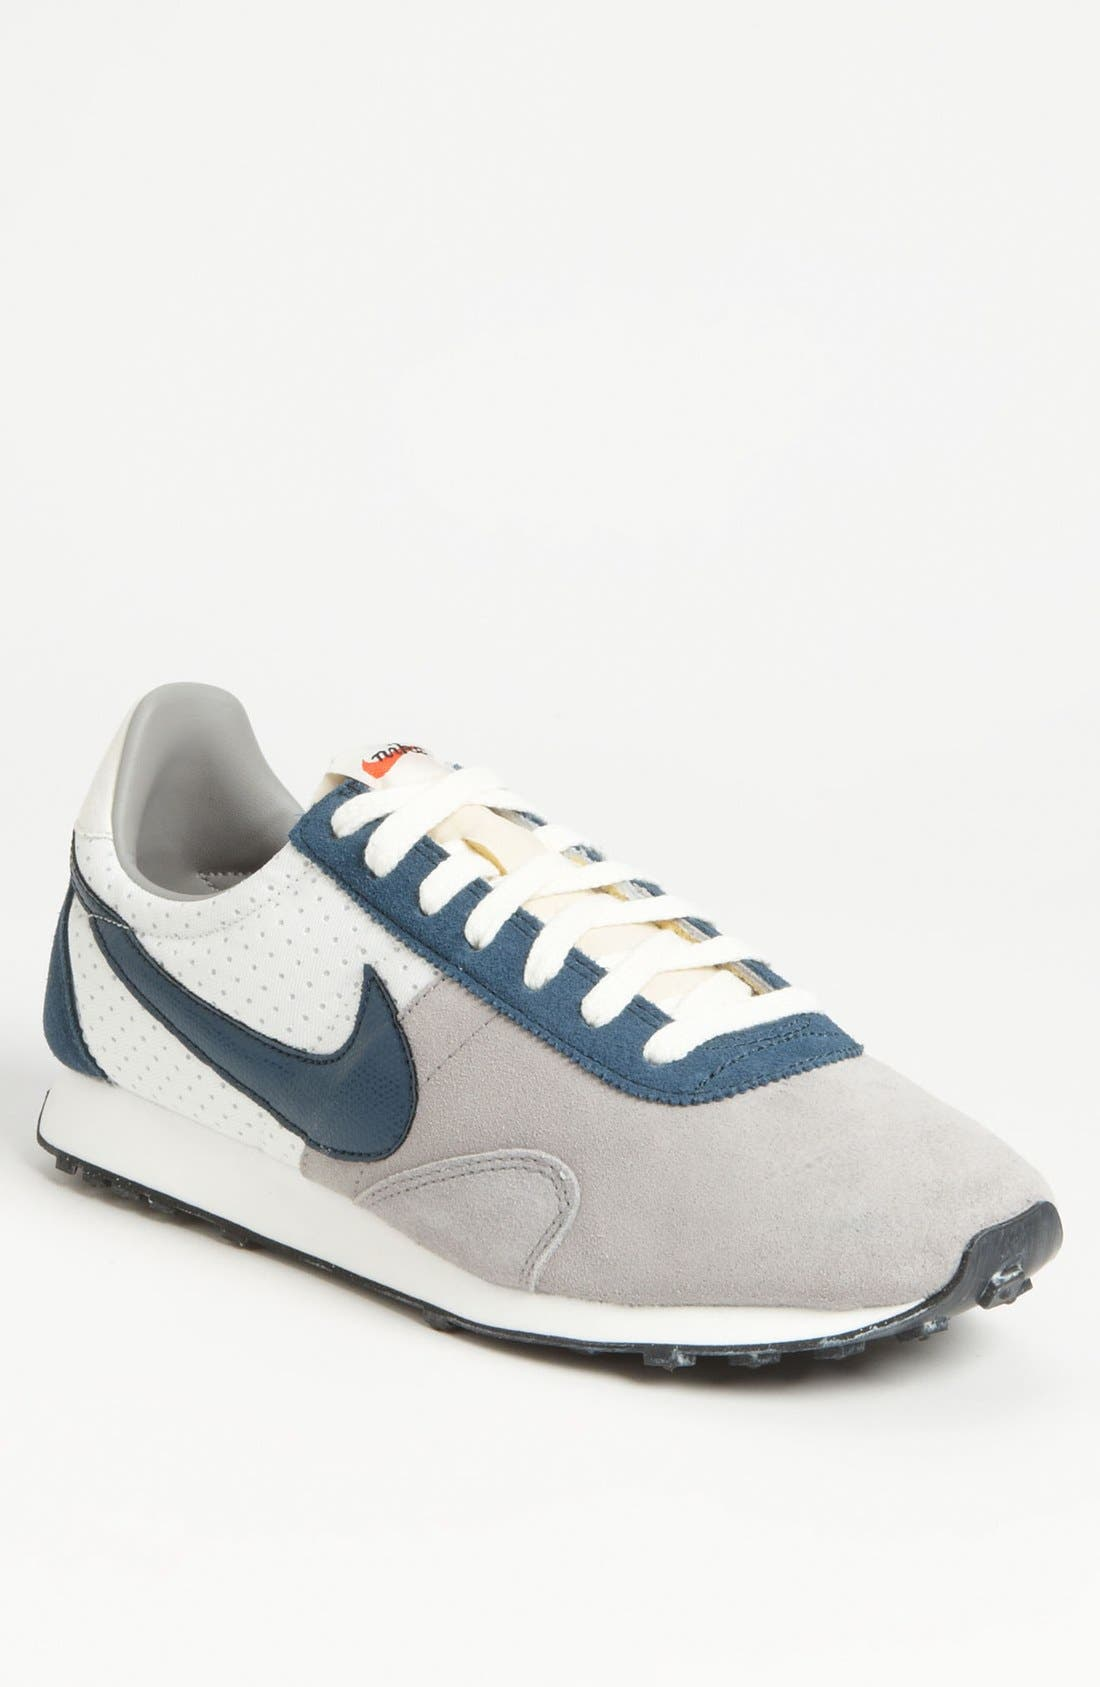 Alternate Image 1 Selected - Nike 'Pre Montreal Racer' Sneaker (Men)